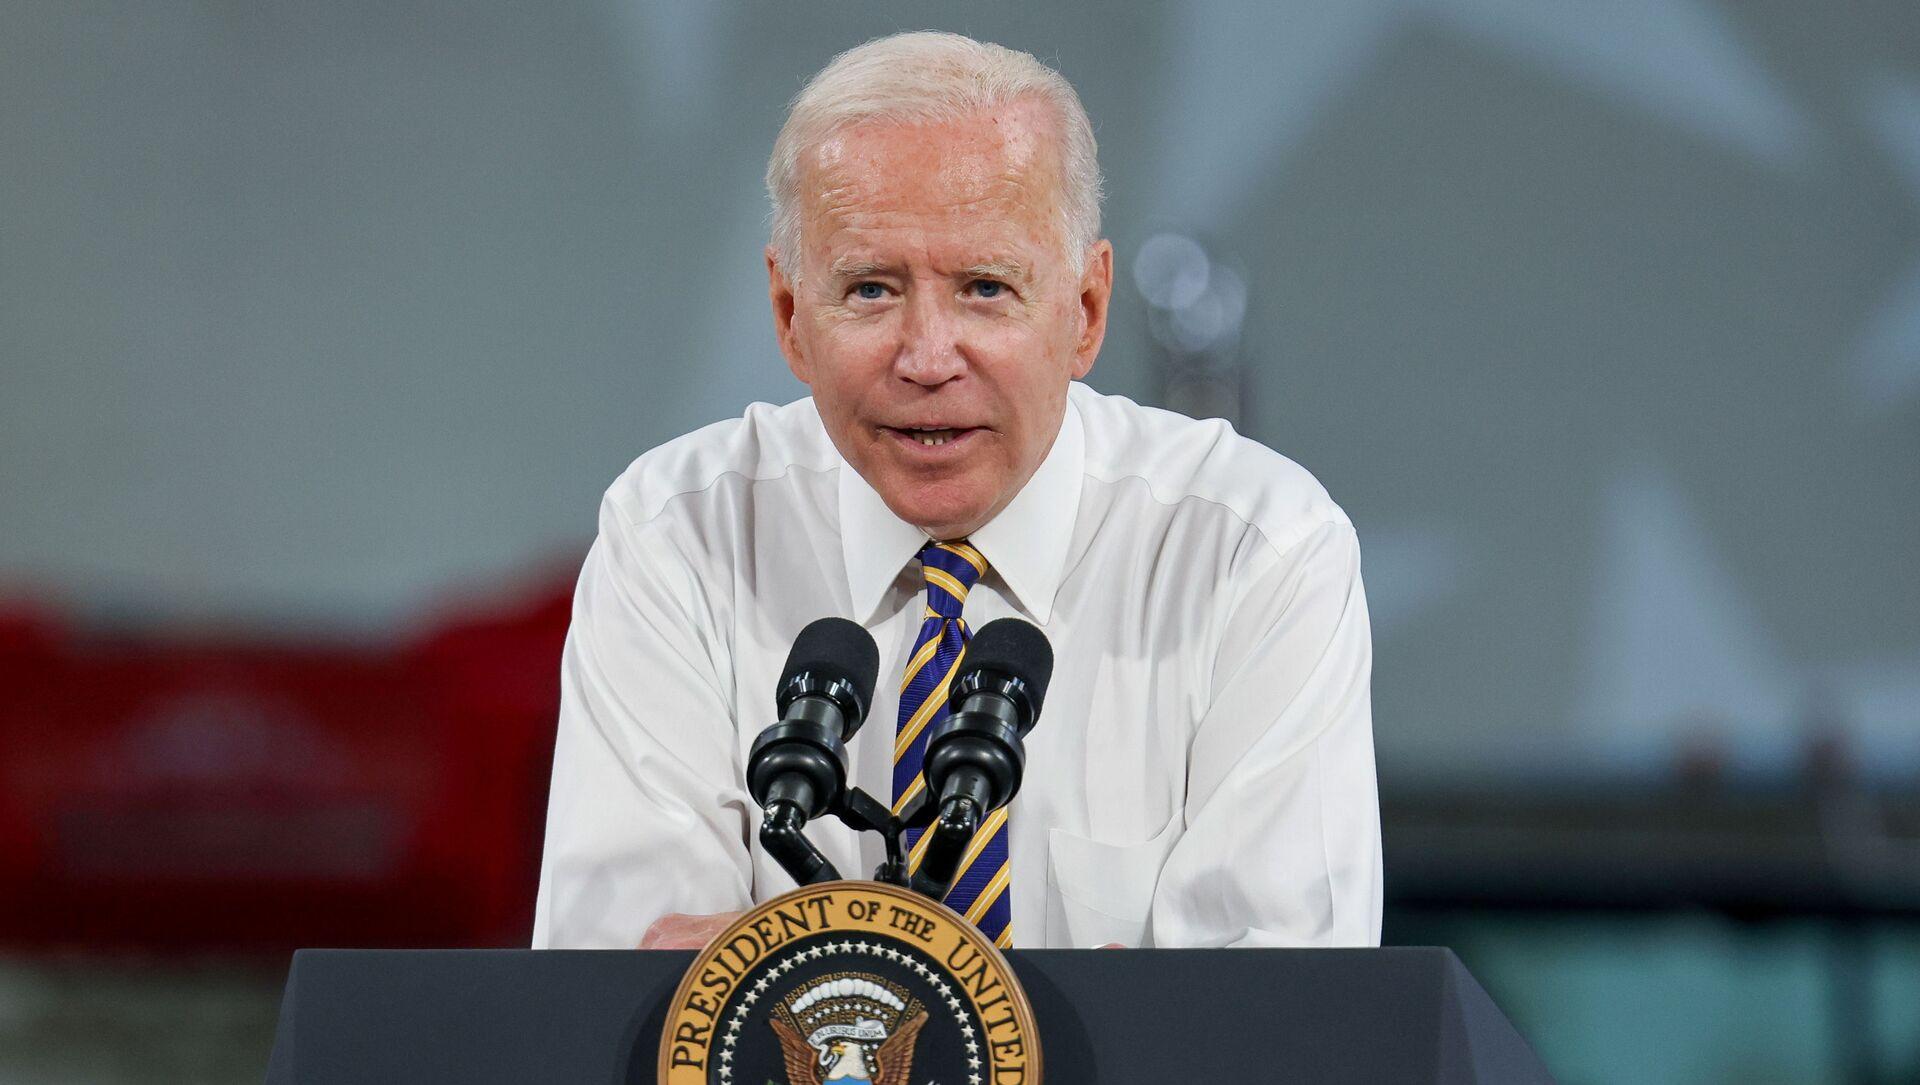 U.S. President Joe Biden speaks during a visit to the Mack-Lehigh Valley Operations Manufacturing Facility in Macungie, Pensylvania, U.S., July 28, 2021 - Sputnik International, 1920, 29.07.2021